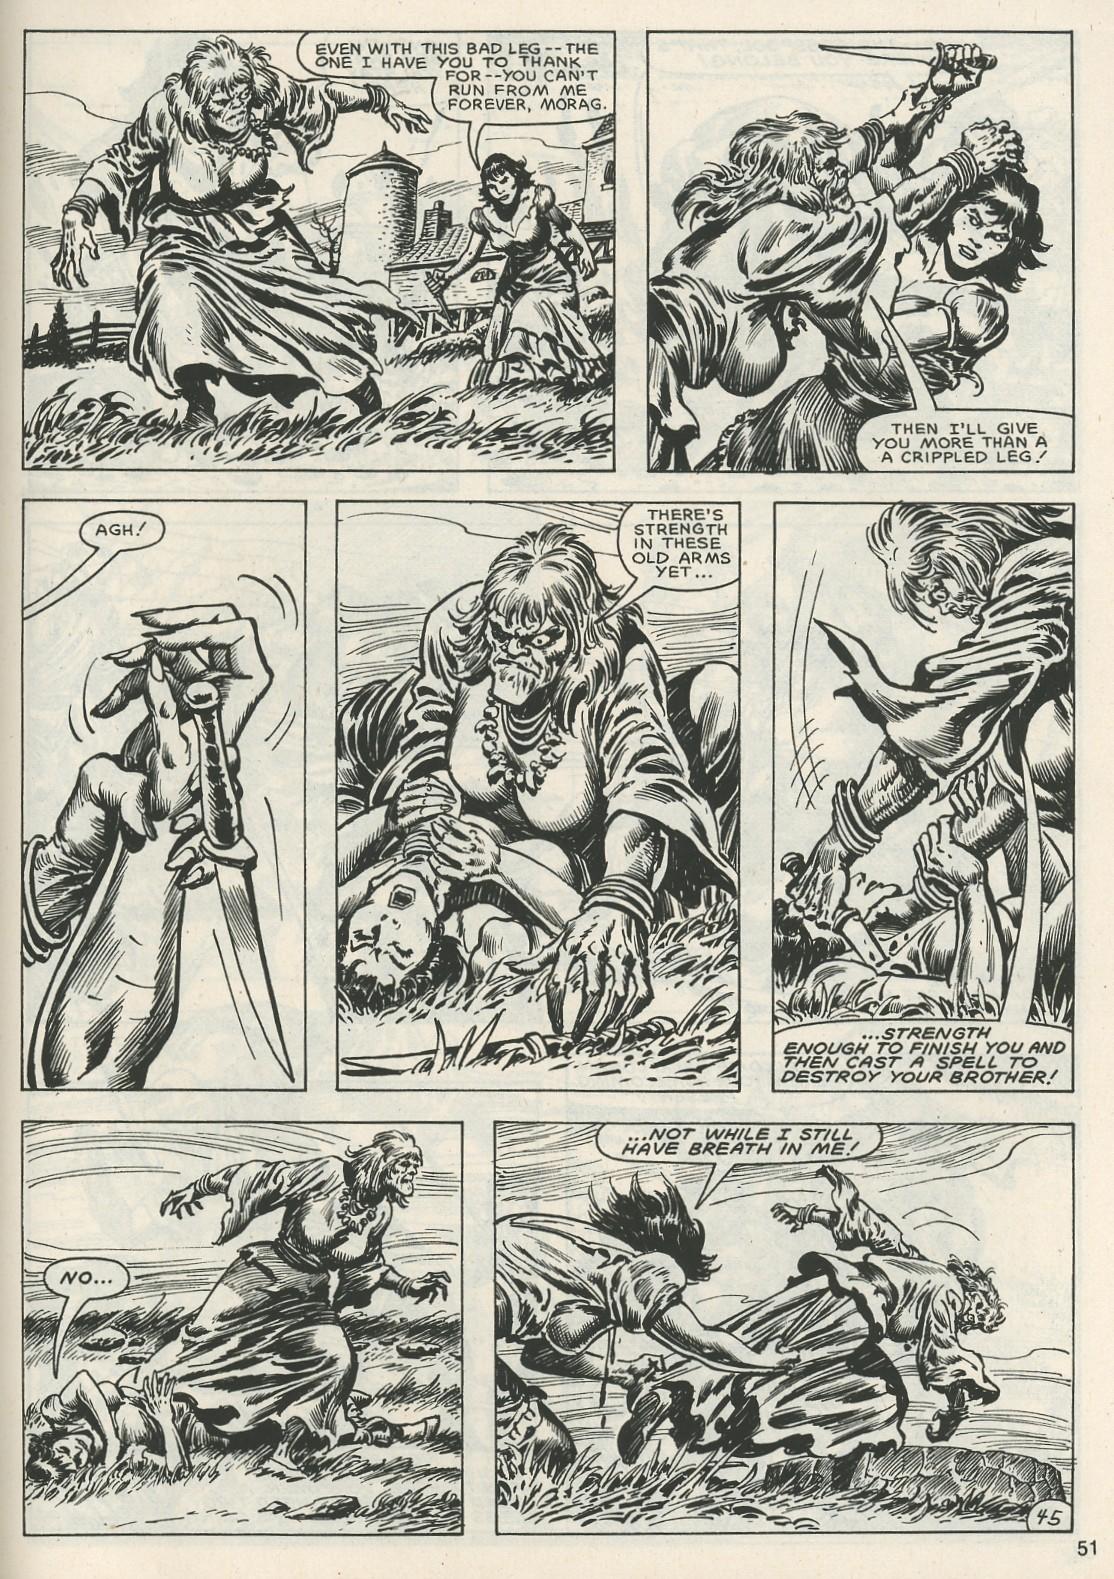 Comic The Savage Sword Of Conan issue 120